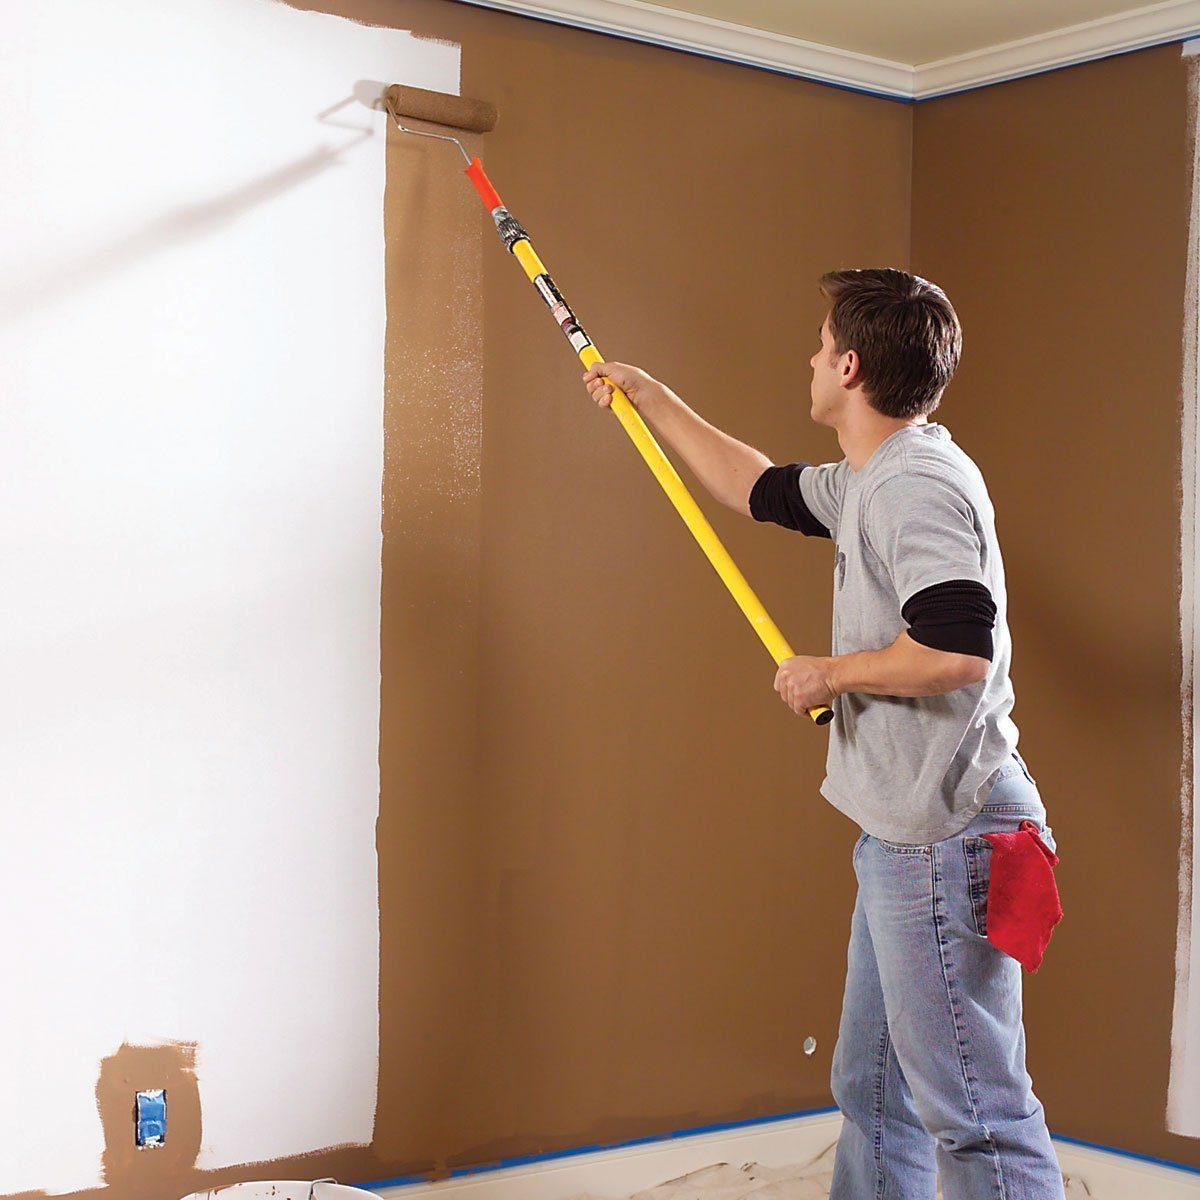 interior painting tips avoid lap marks